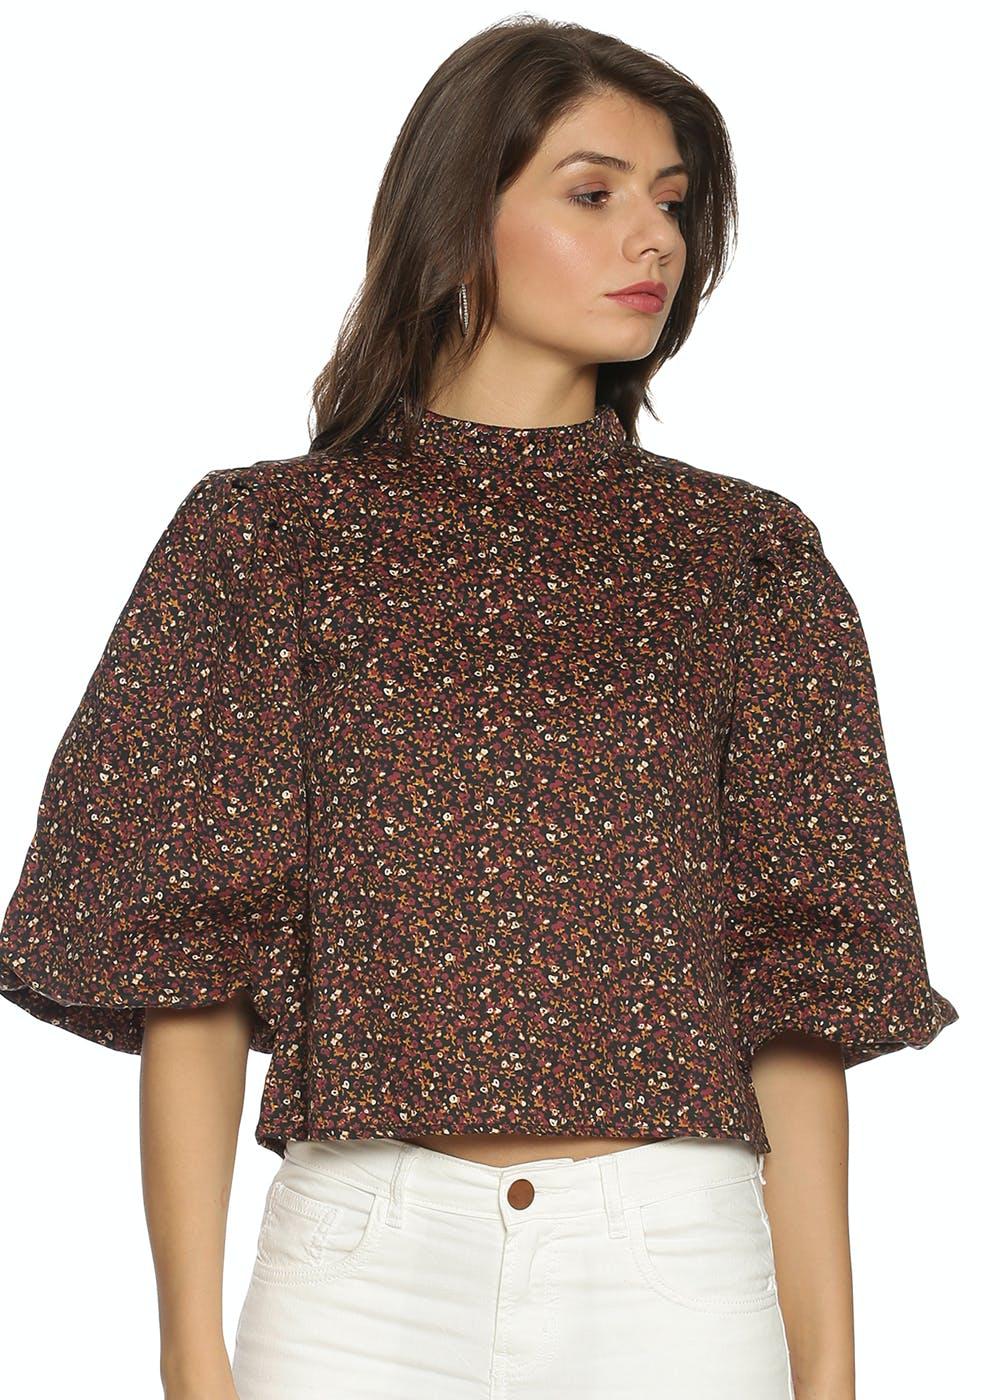 Floral Puff Sleeve Top - Brown